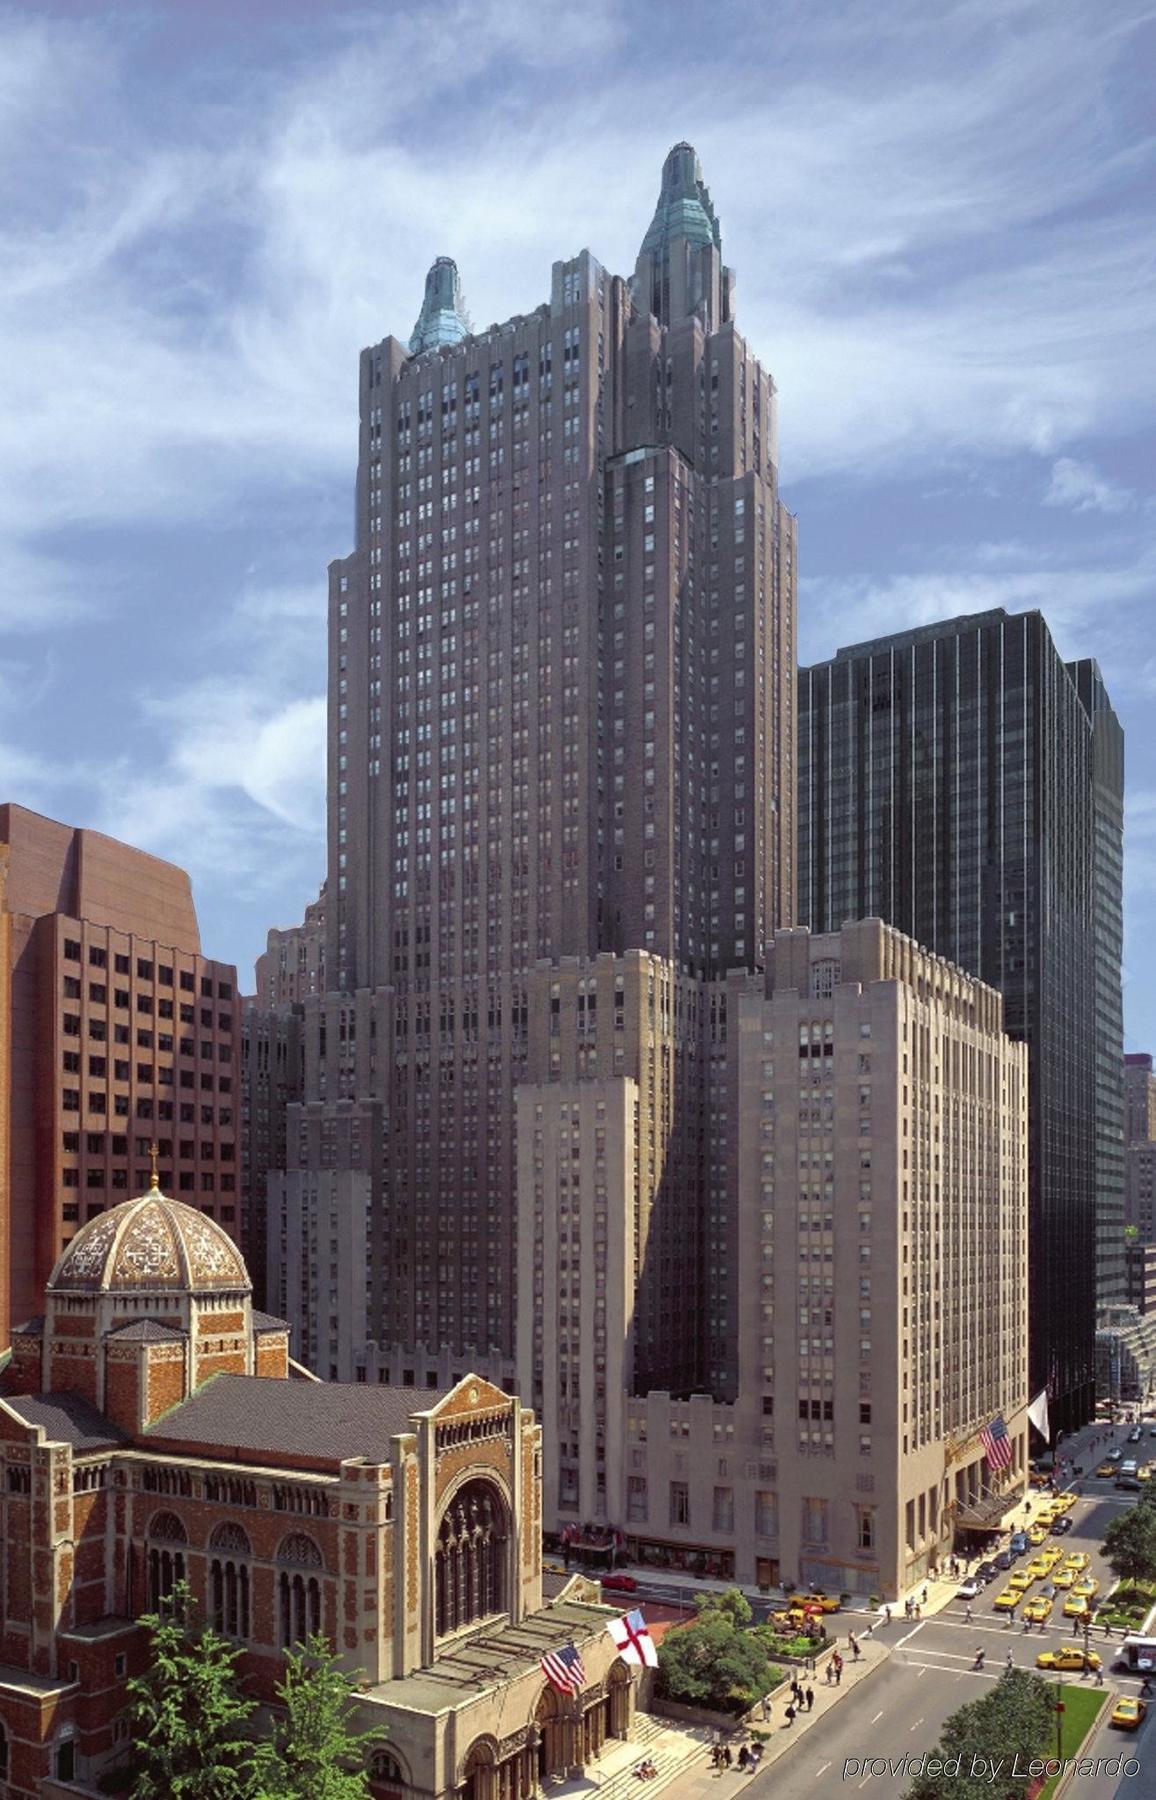 HOTEL WALDORF ASTORIA NEW YORK, NEW YORK CITY